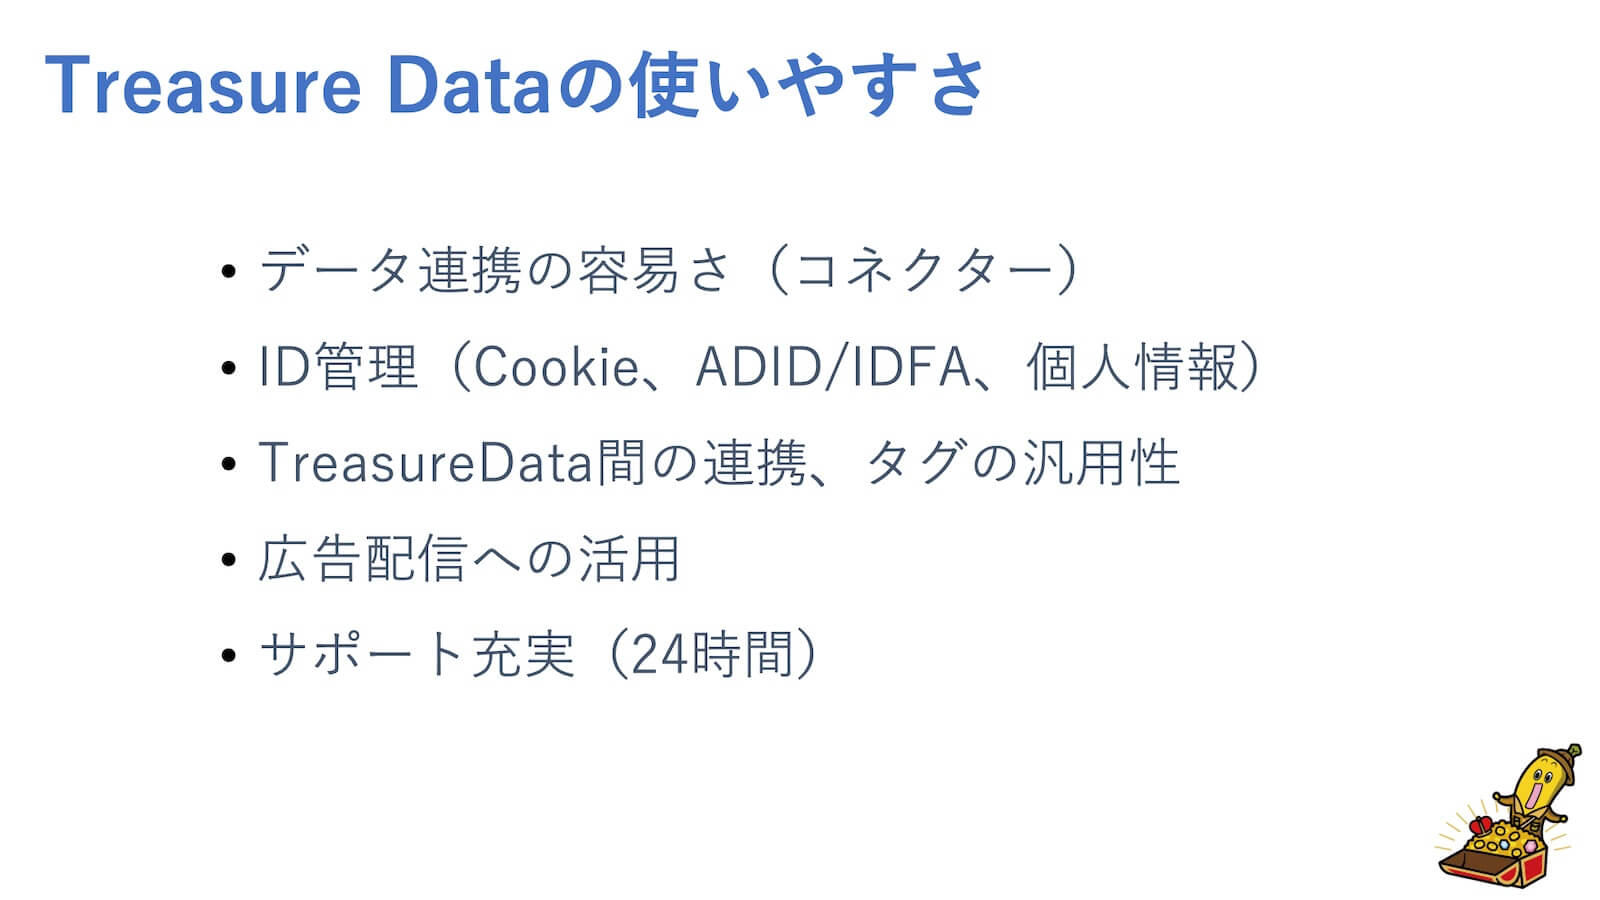 Treasure Data CDPの使いやすさ